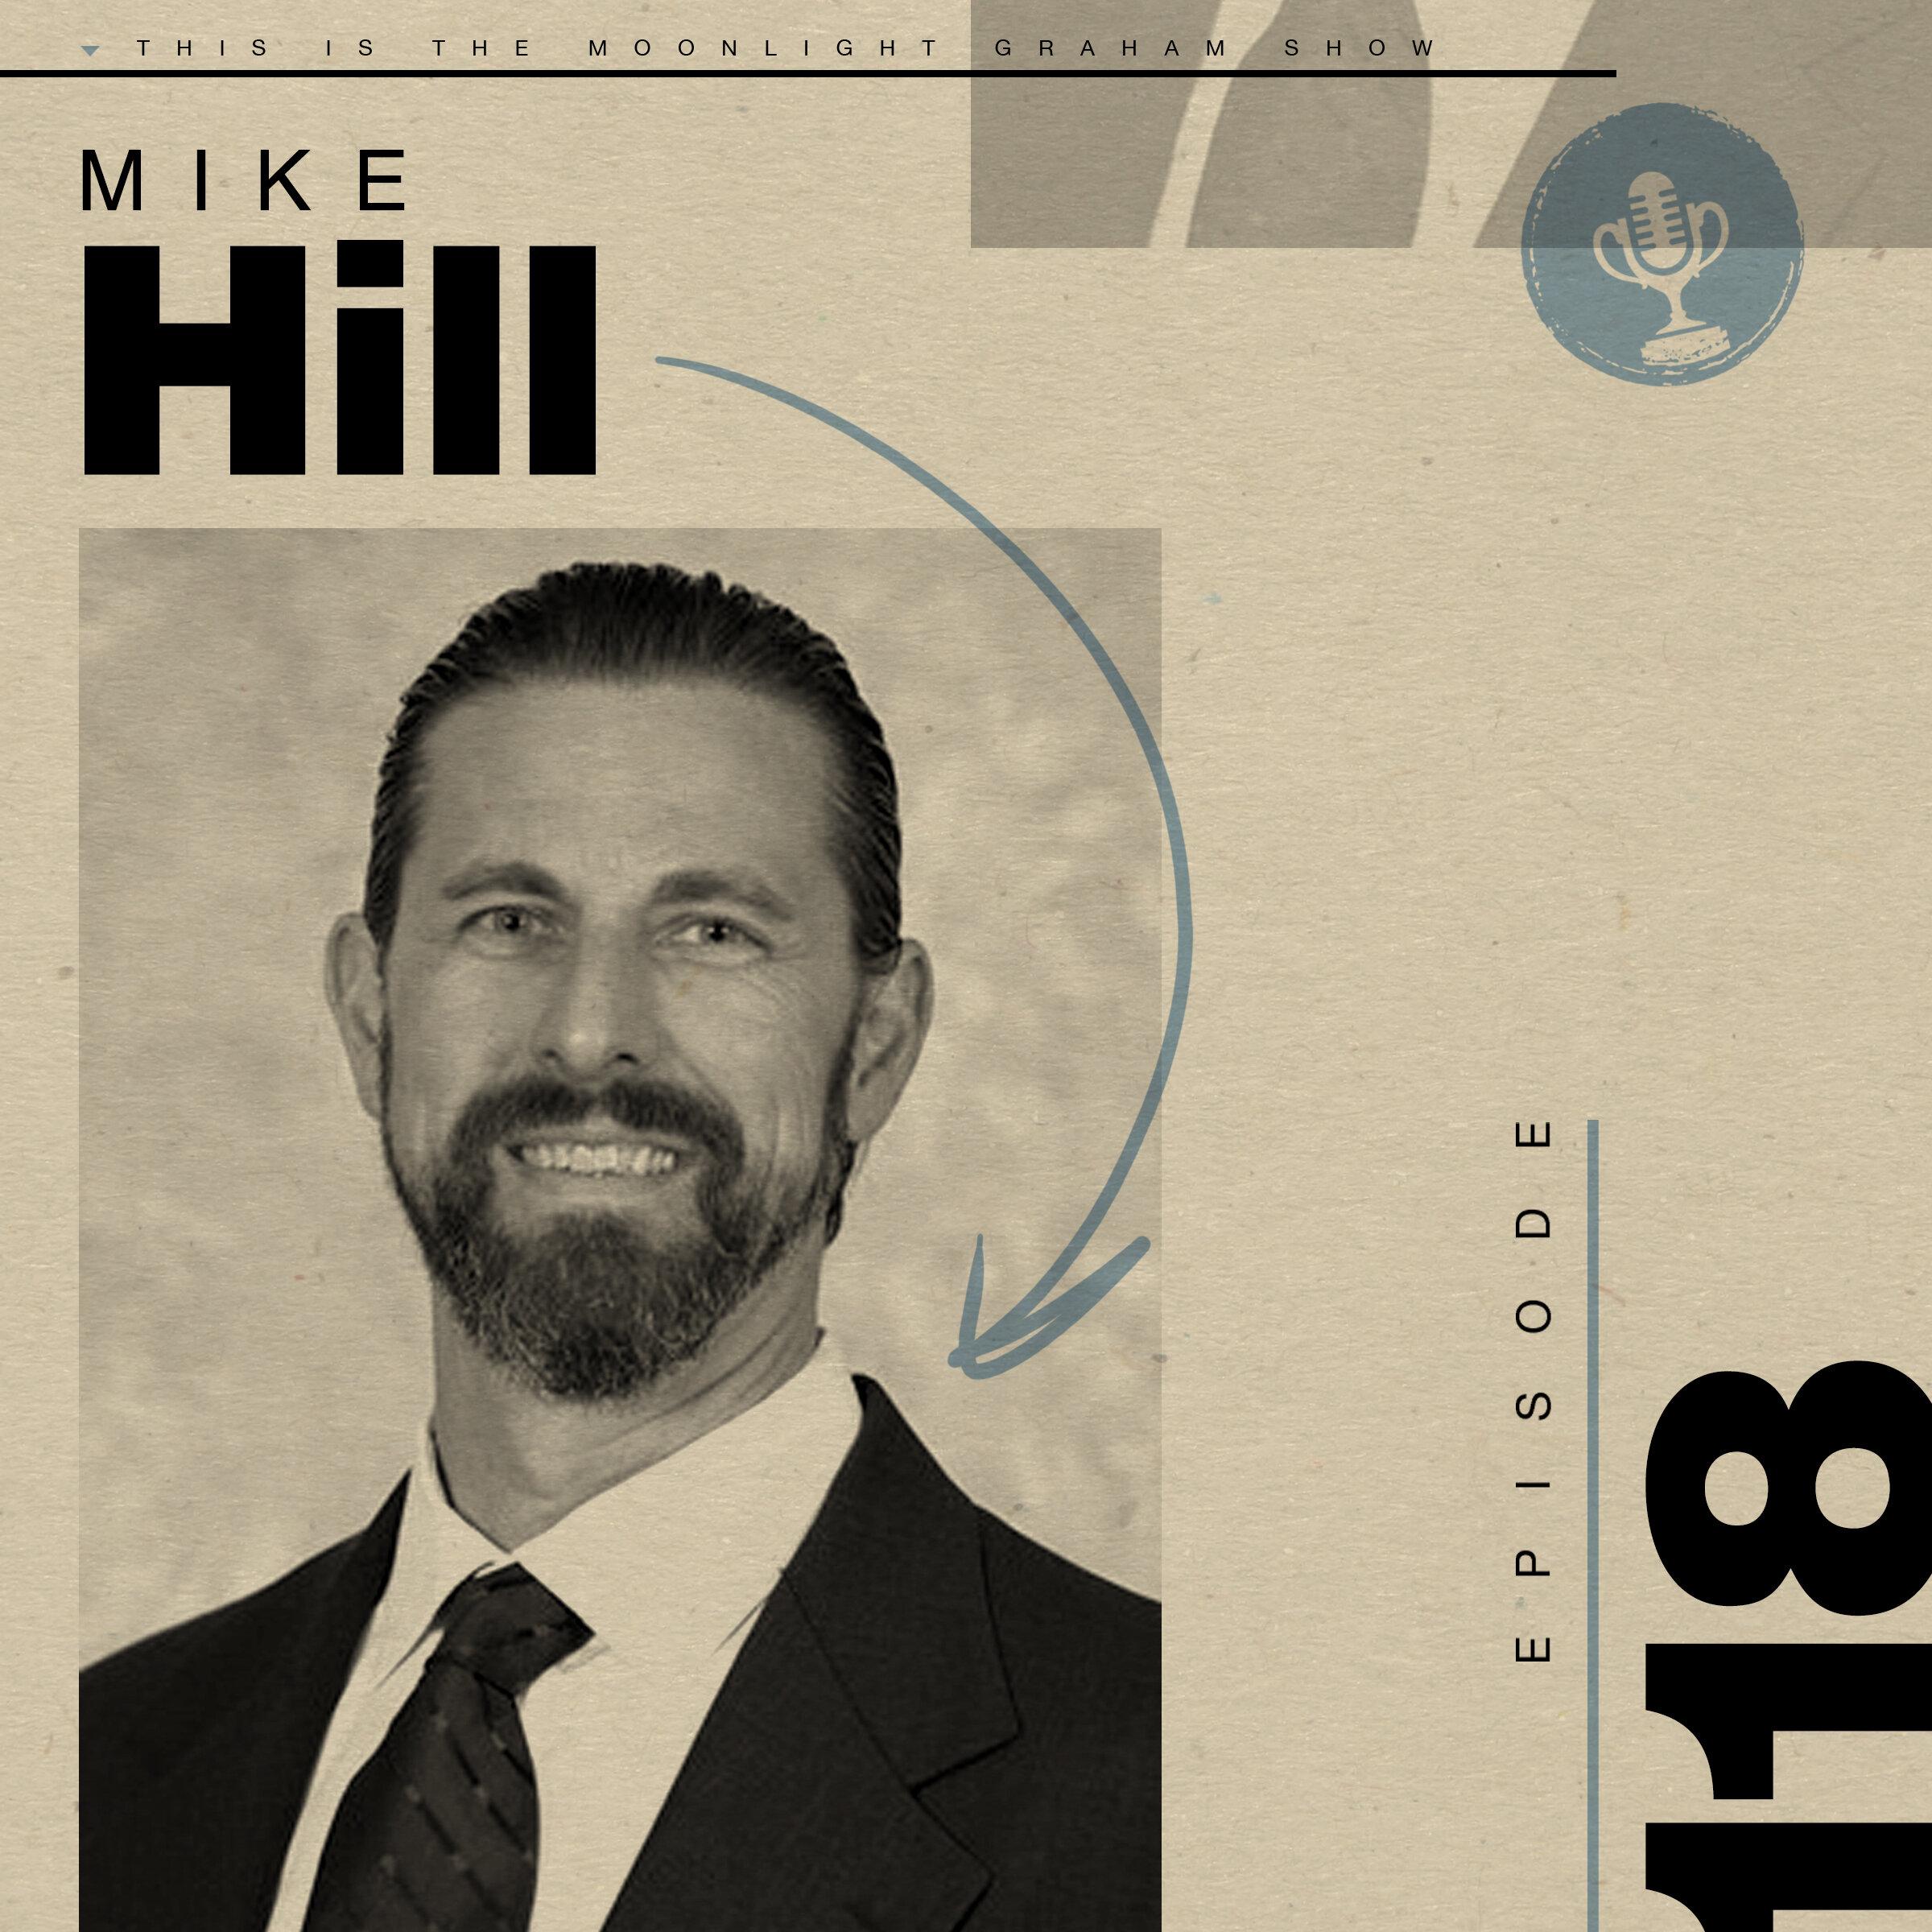 118_hill.jpg